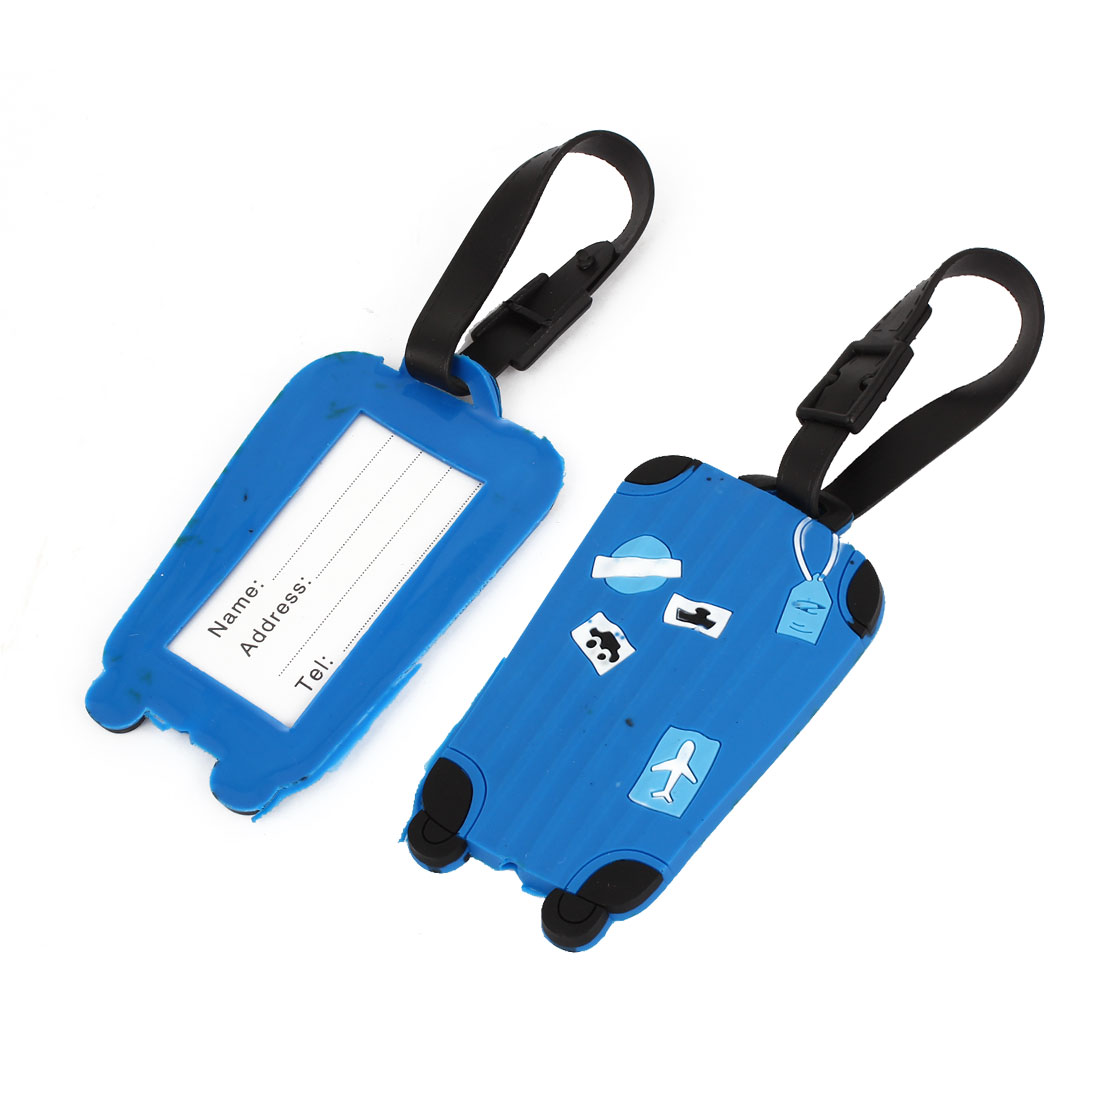 Dark Blue Plastic Cyan Plane Car Ship Printed Luggage Baggage Tag Label 2 Pcs